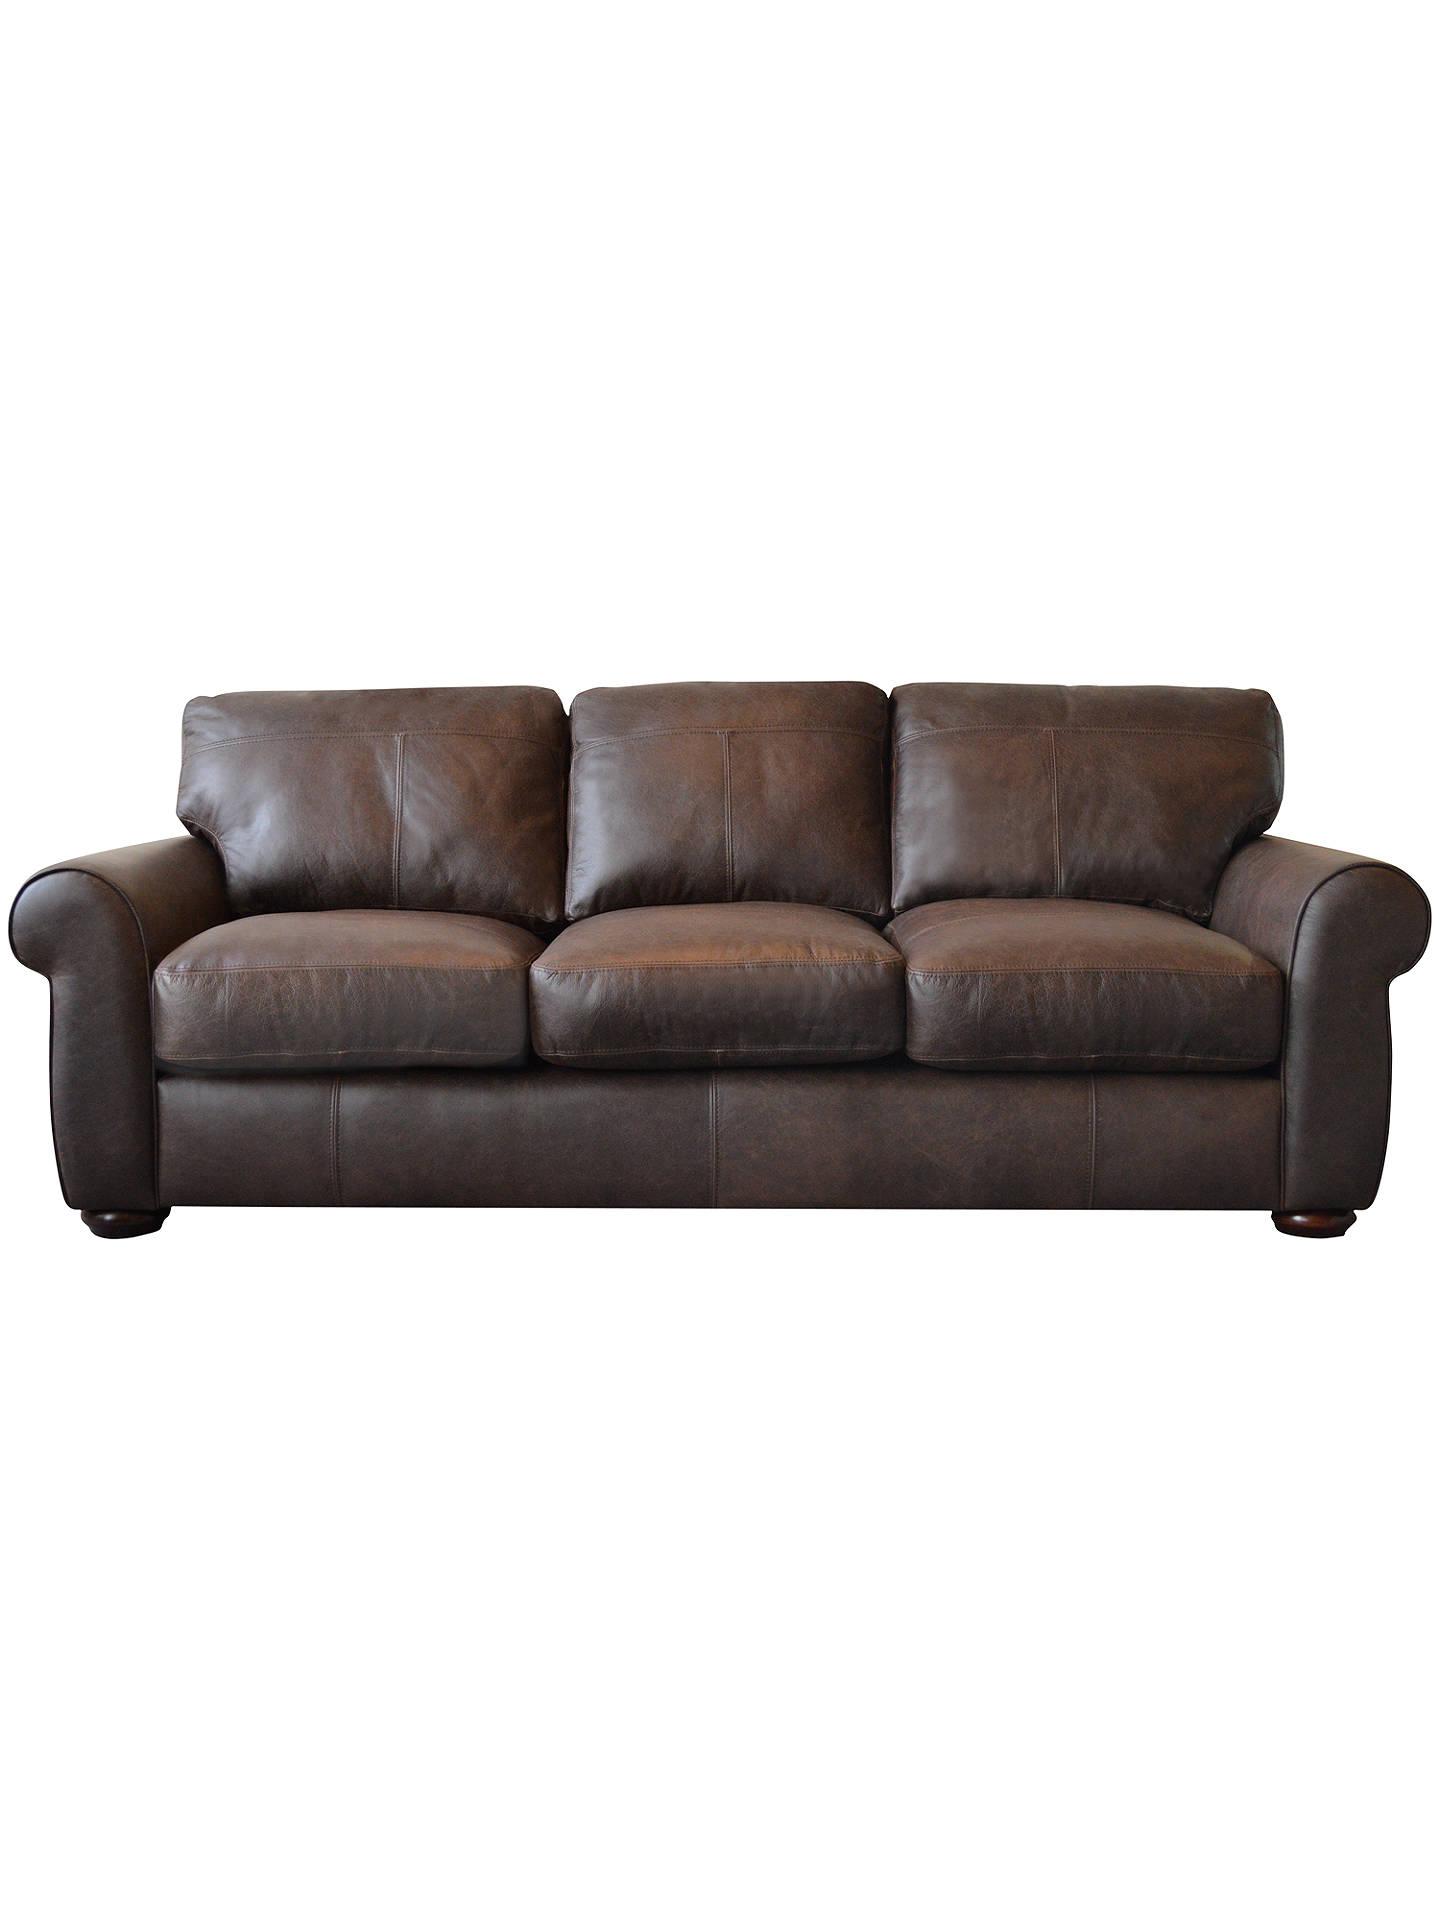 John Lewis Madison Semi Aniline Grand Leather Sofa Colorado Online At Johnlewis